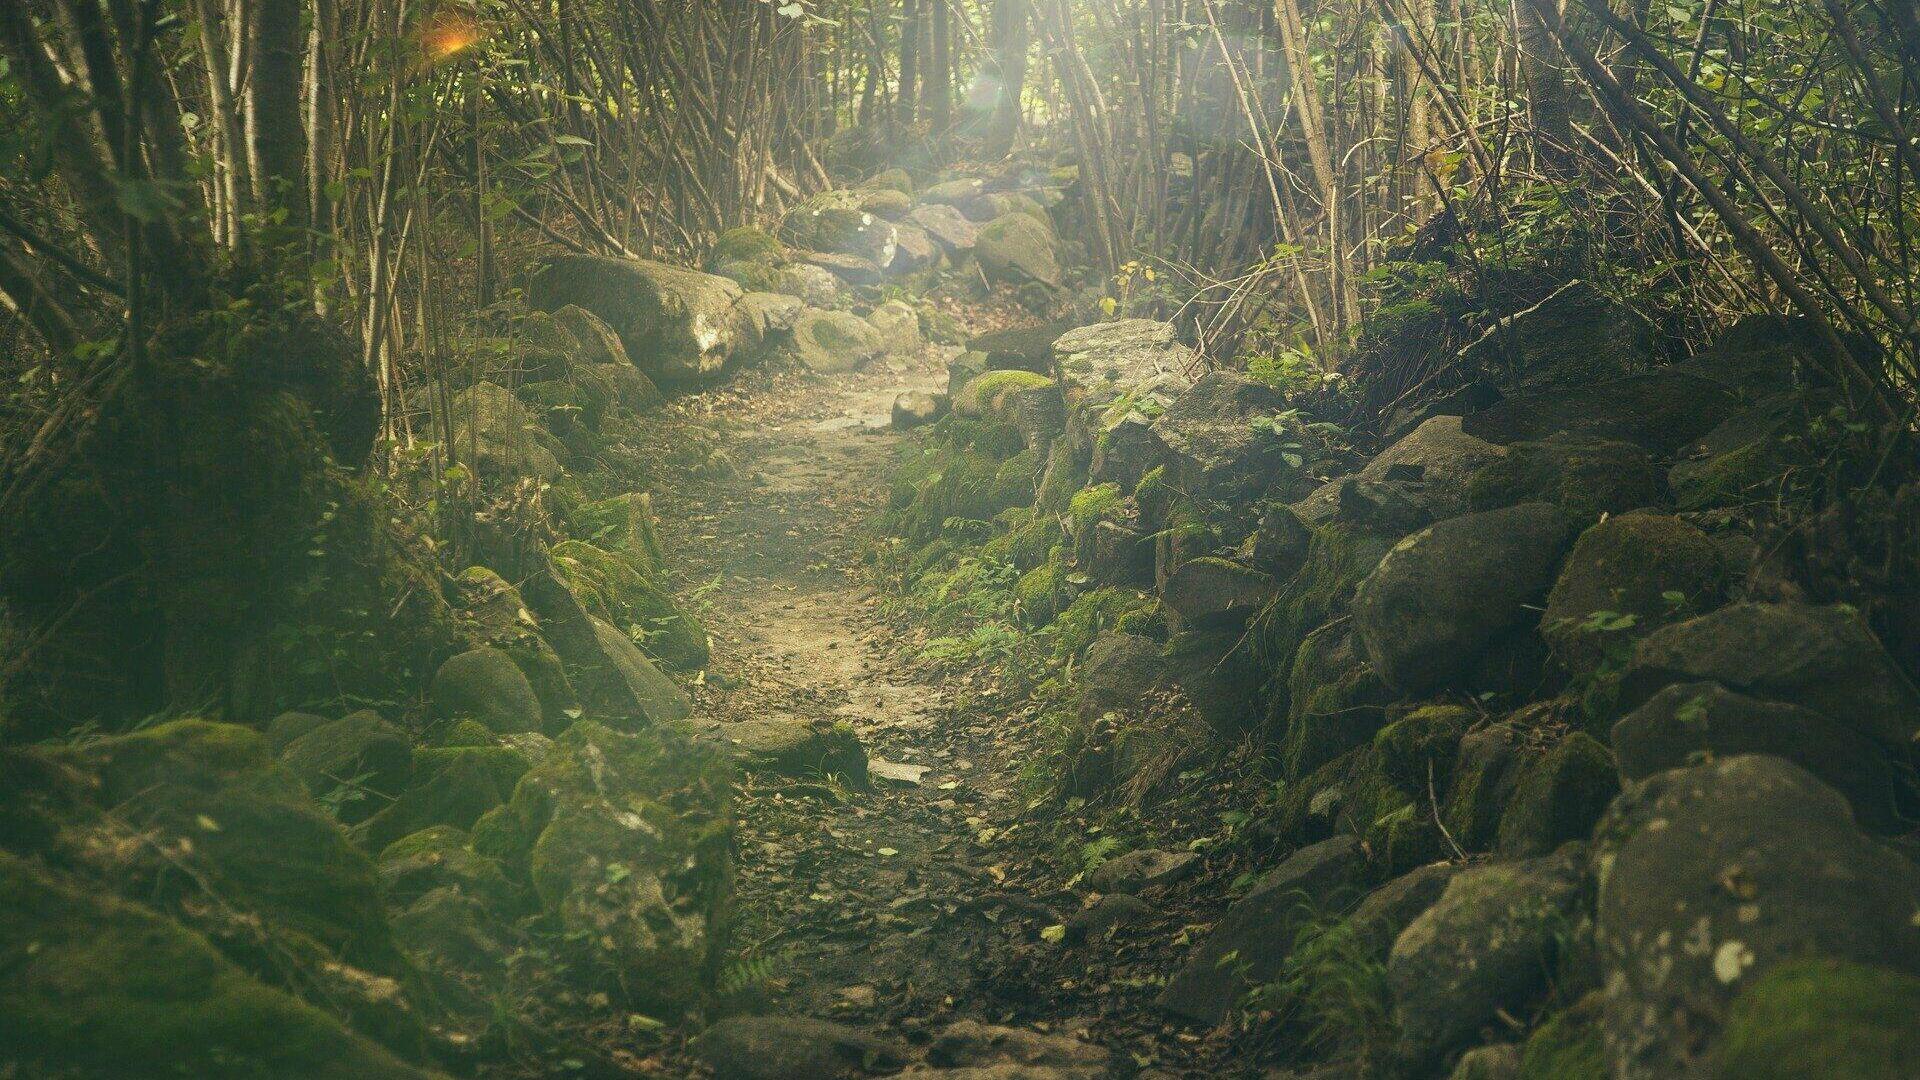 Wald (Symbolbild) - SNA, 1920, 16.09.2021